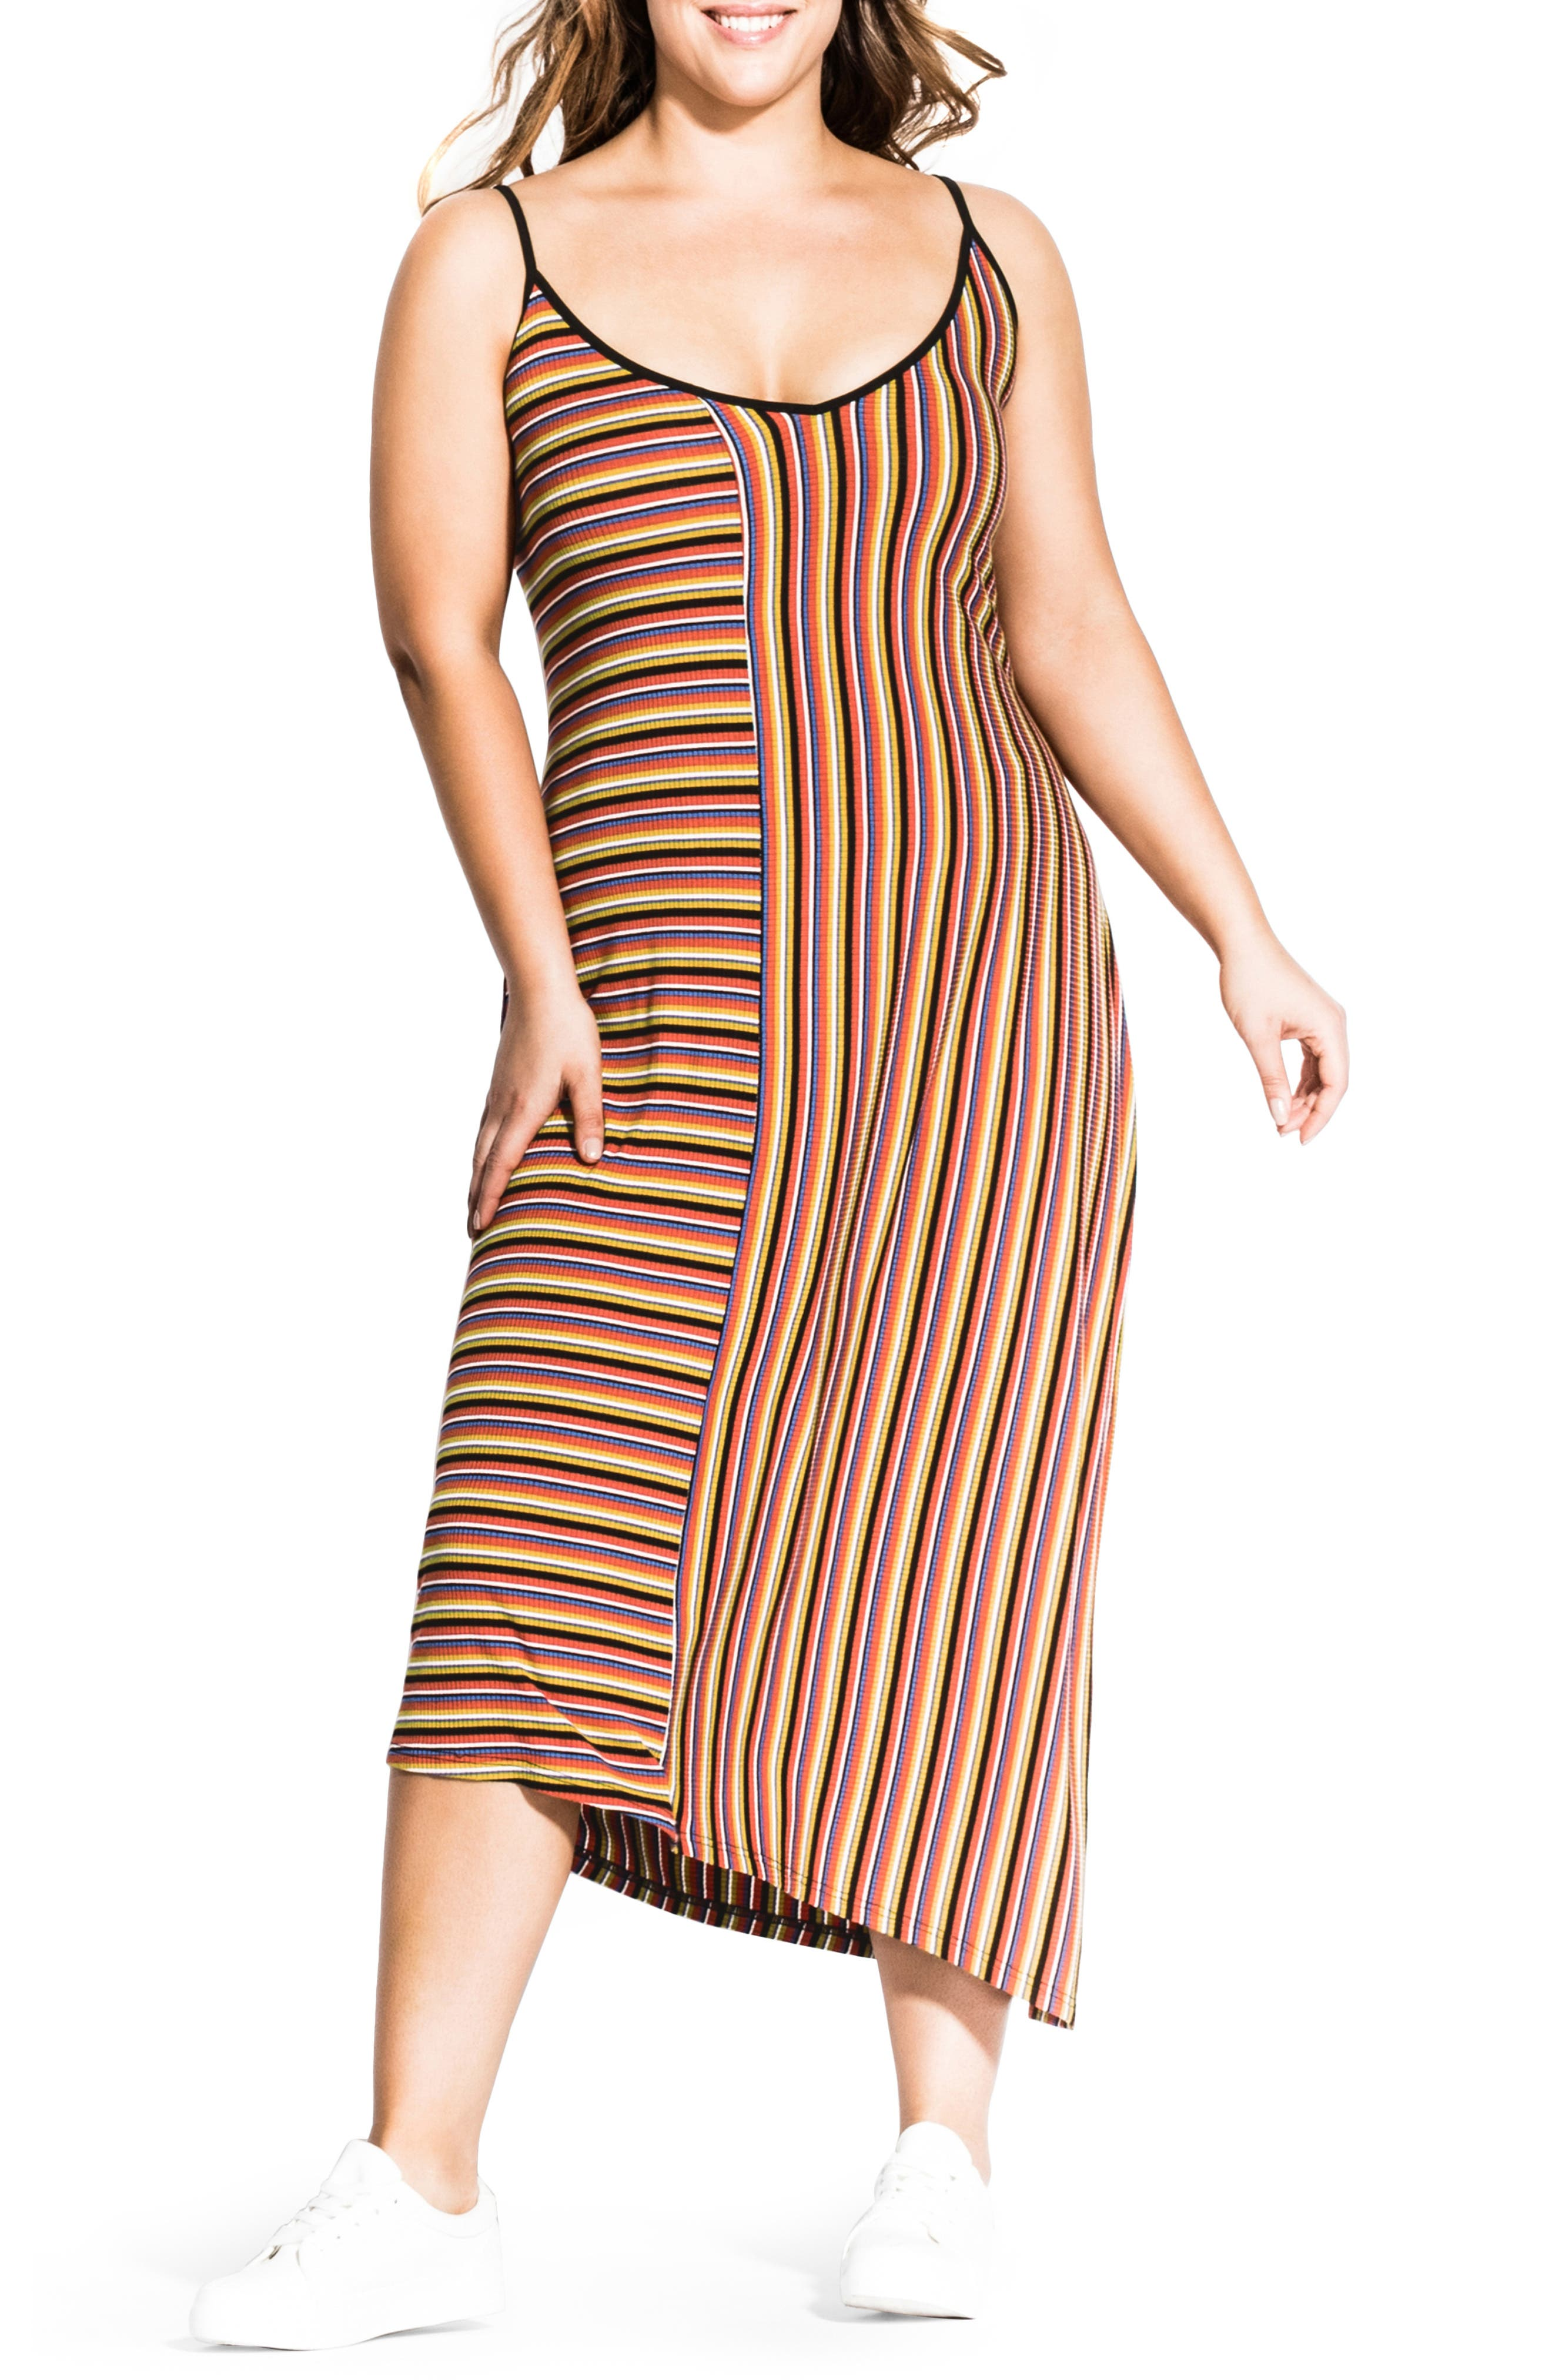 Plus Size City Chic Retro Stripe Asymmetrical Ribbed Midi Dress, Blue